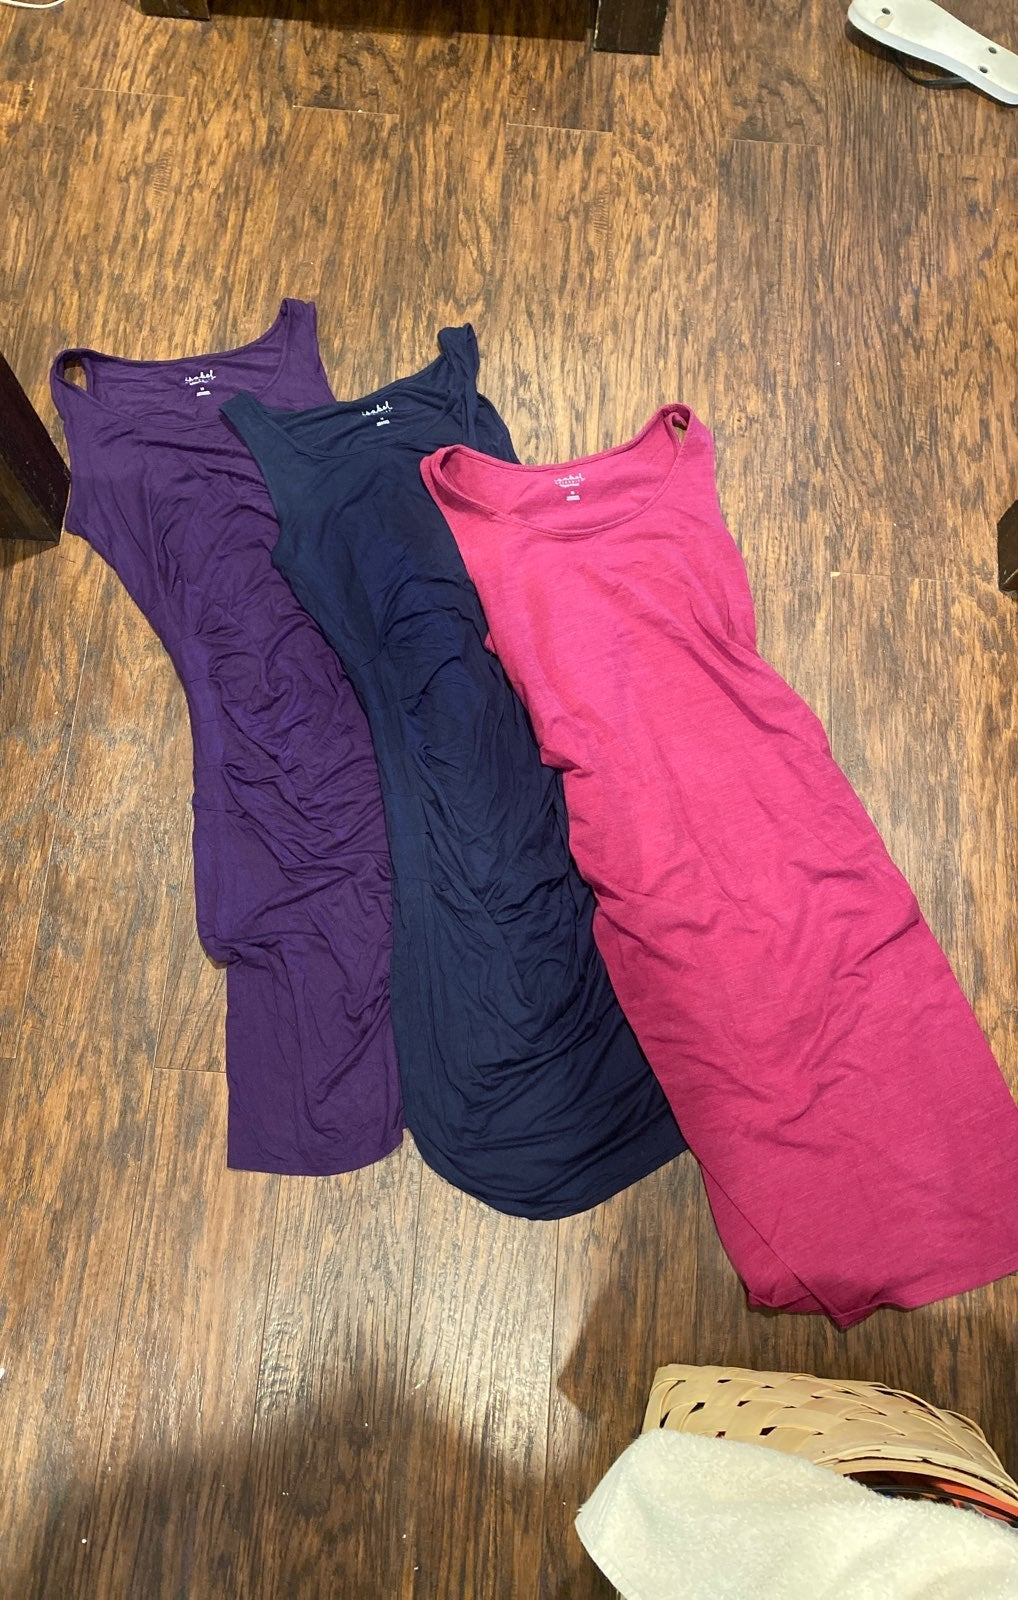 3 MEDIUM Isabel Maternity Dresses